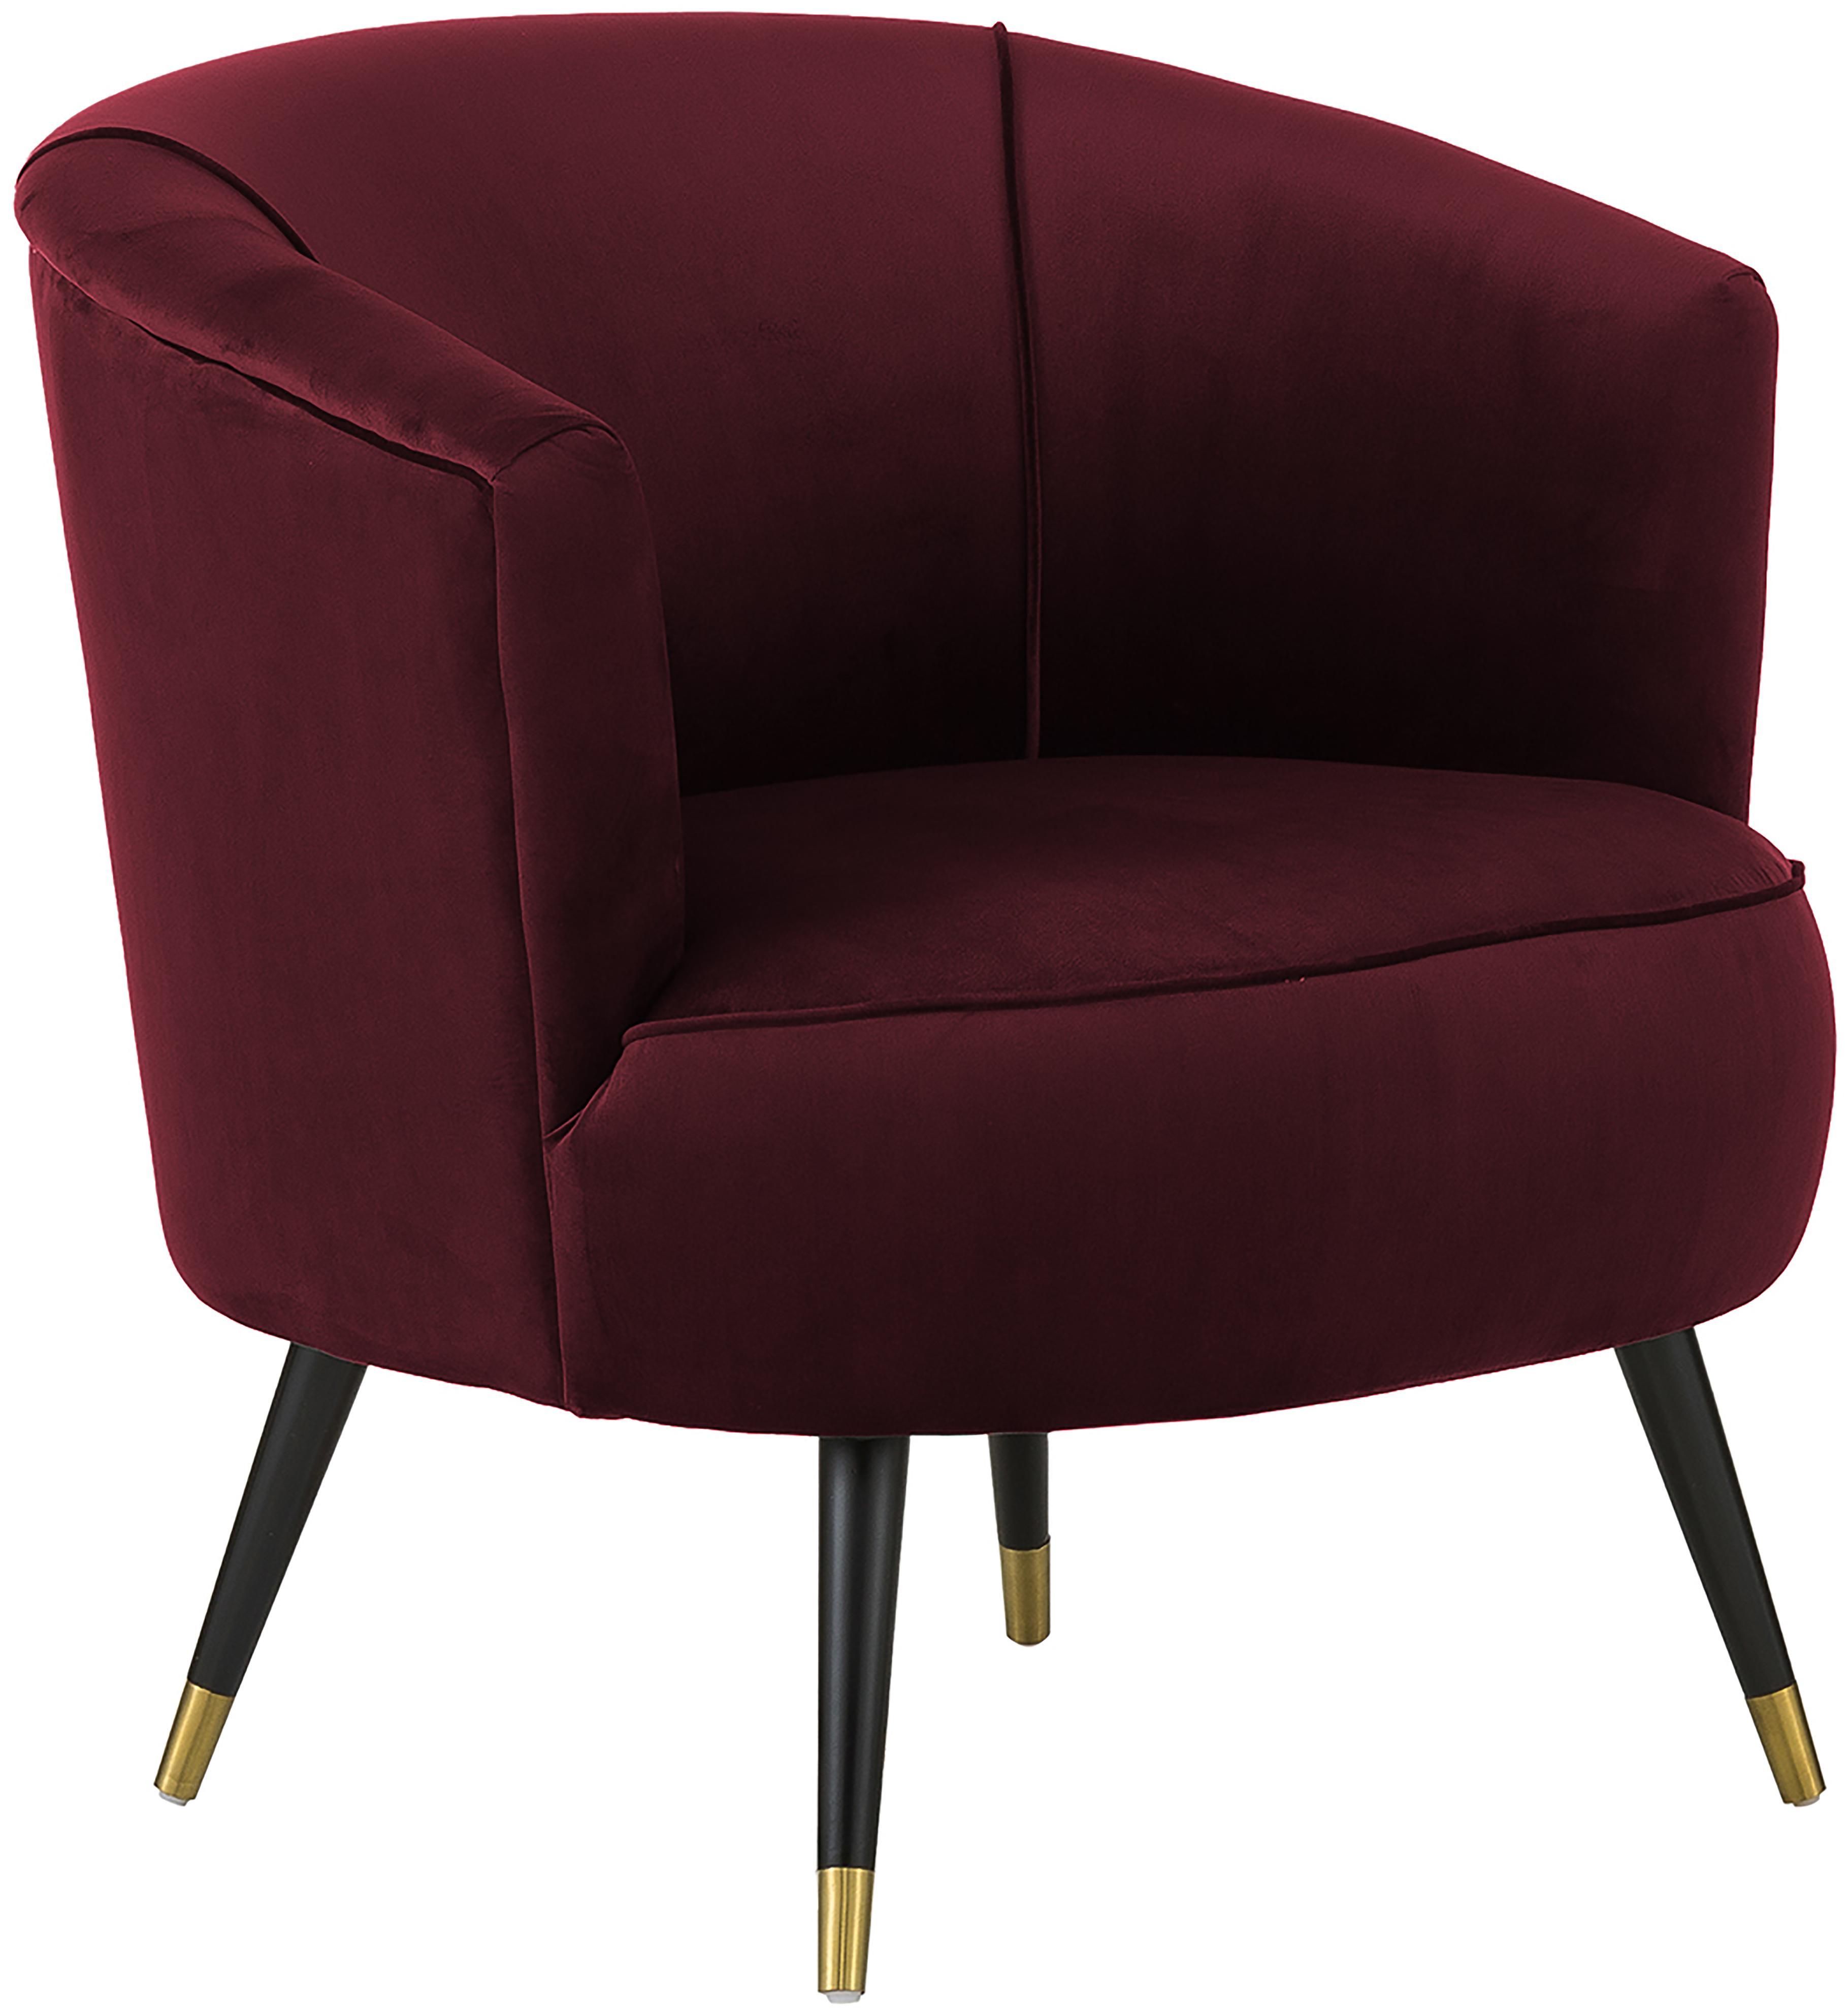 Fluwelen fauteuil Ella, Bekleding: fluweel (polyester), Poten: gelakt metaal, Donkerrood, B 74 x D 78 cm